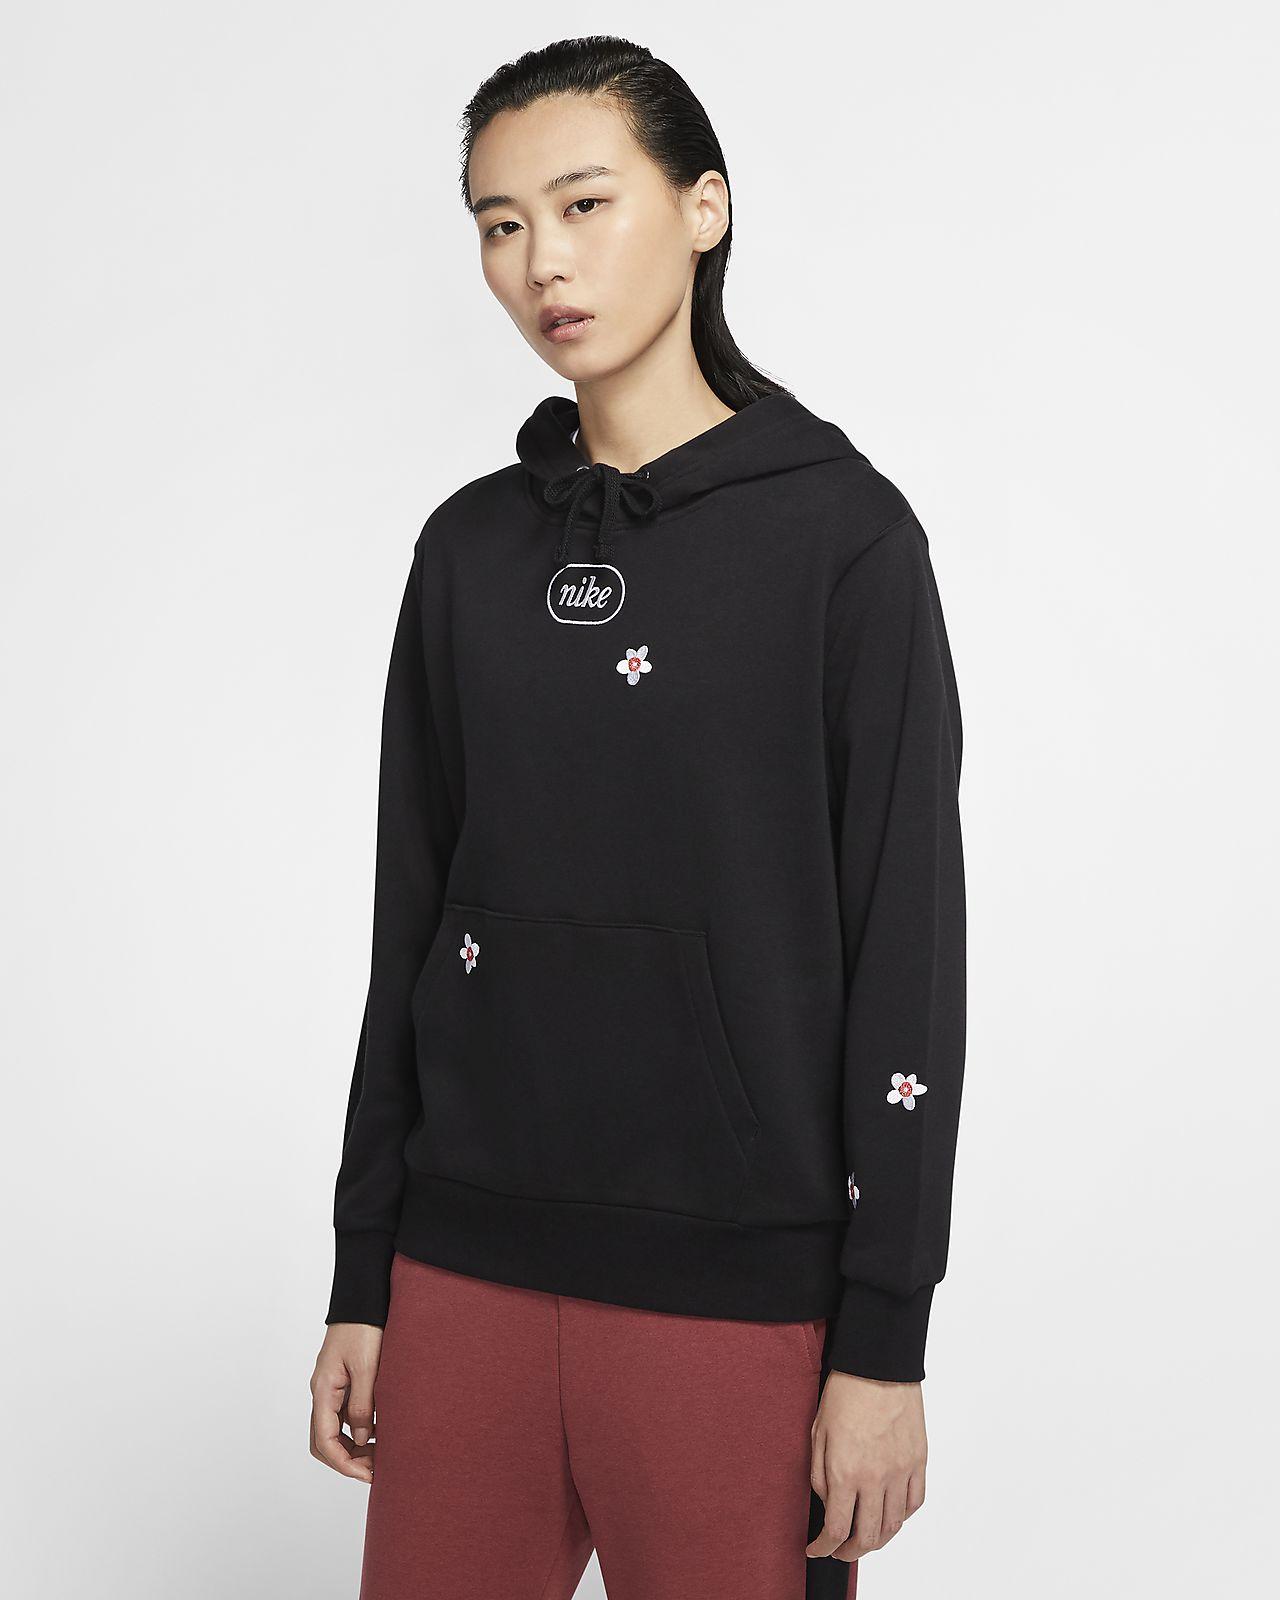 Nike Sportswear 女款連帽上衣